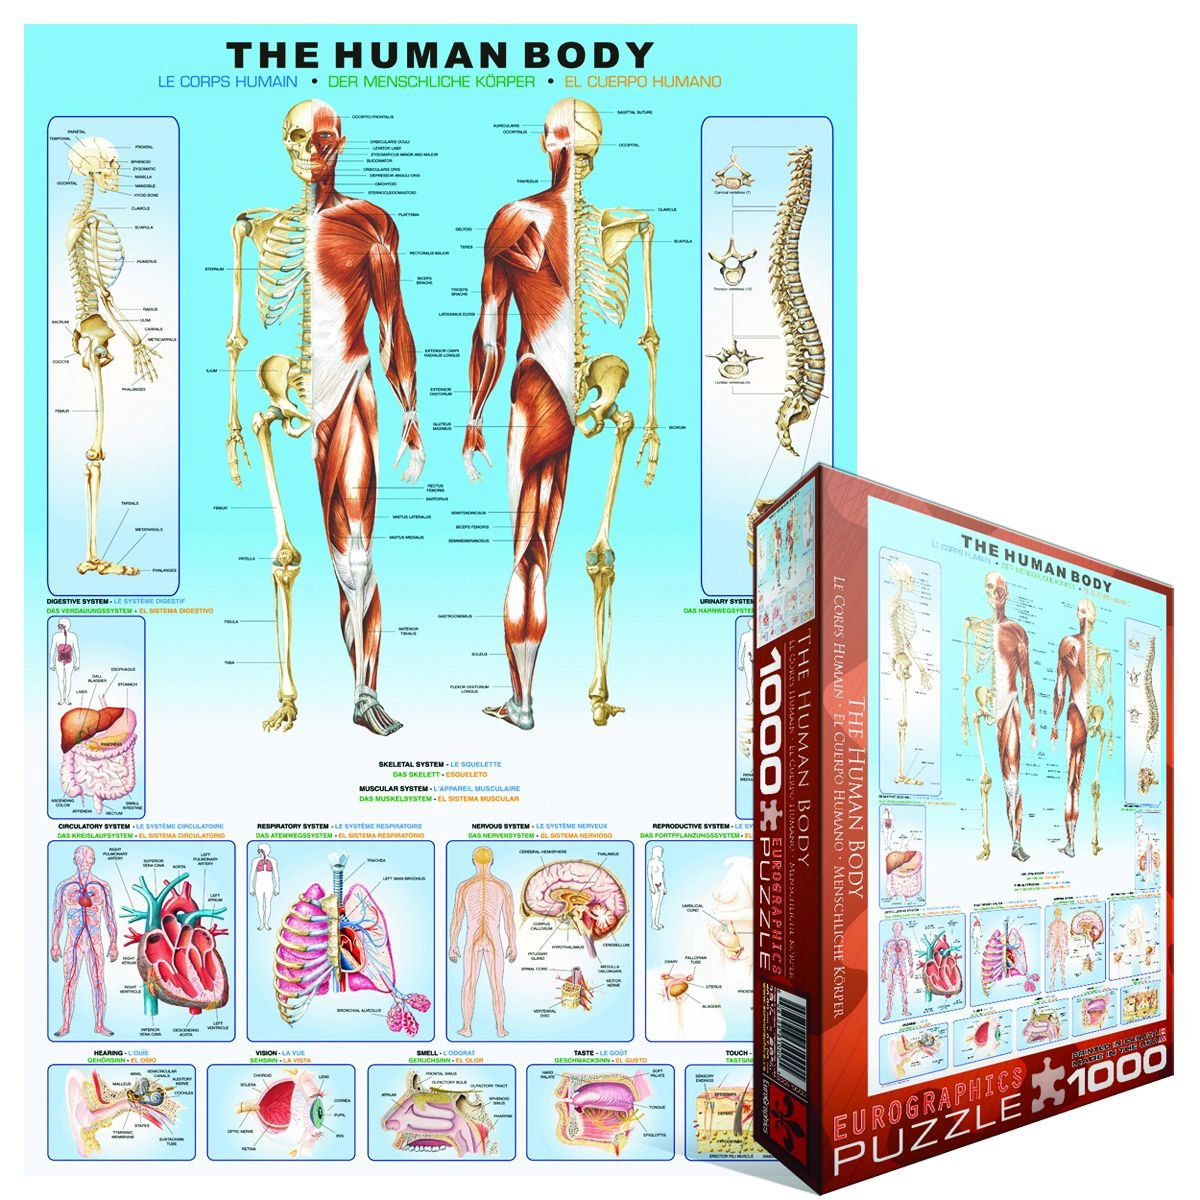 Amazon.com: EuroGraphics Human Body Puzzle (1000-Piece): Toys & Games